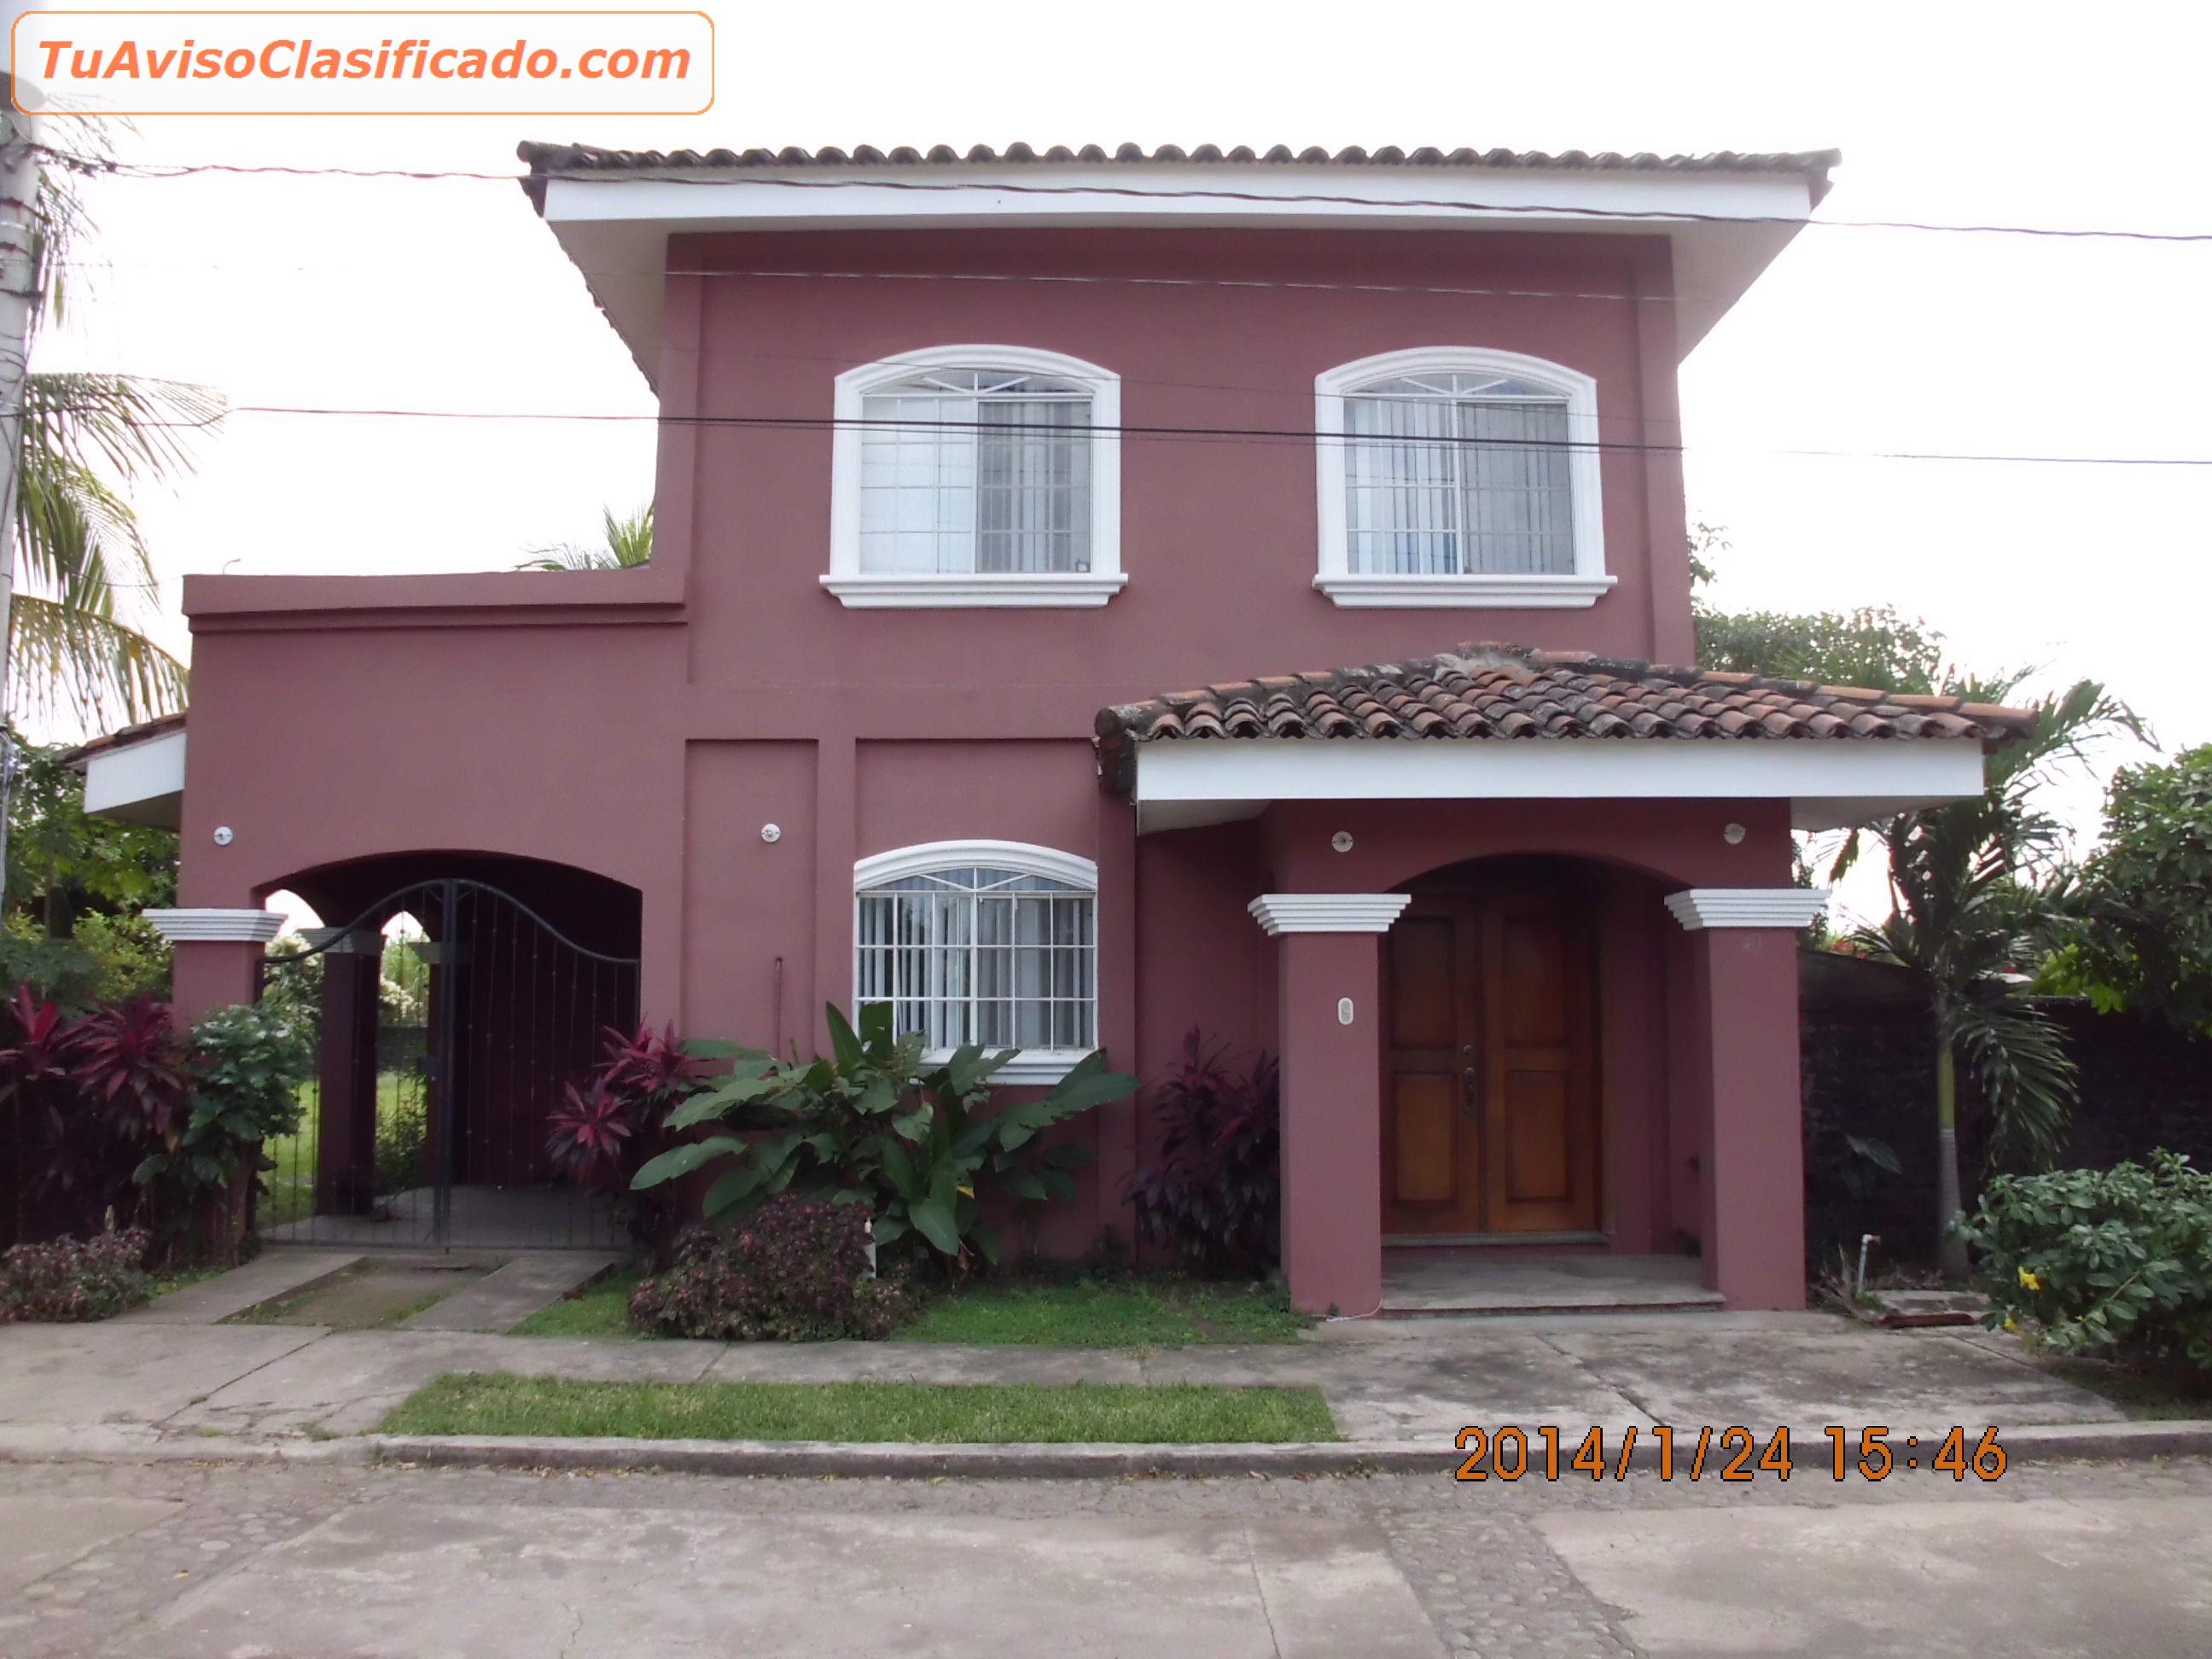 Casa de alquiler chinandega hermosa casa en zona for Casas de alquiler en